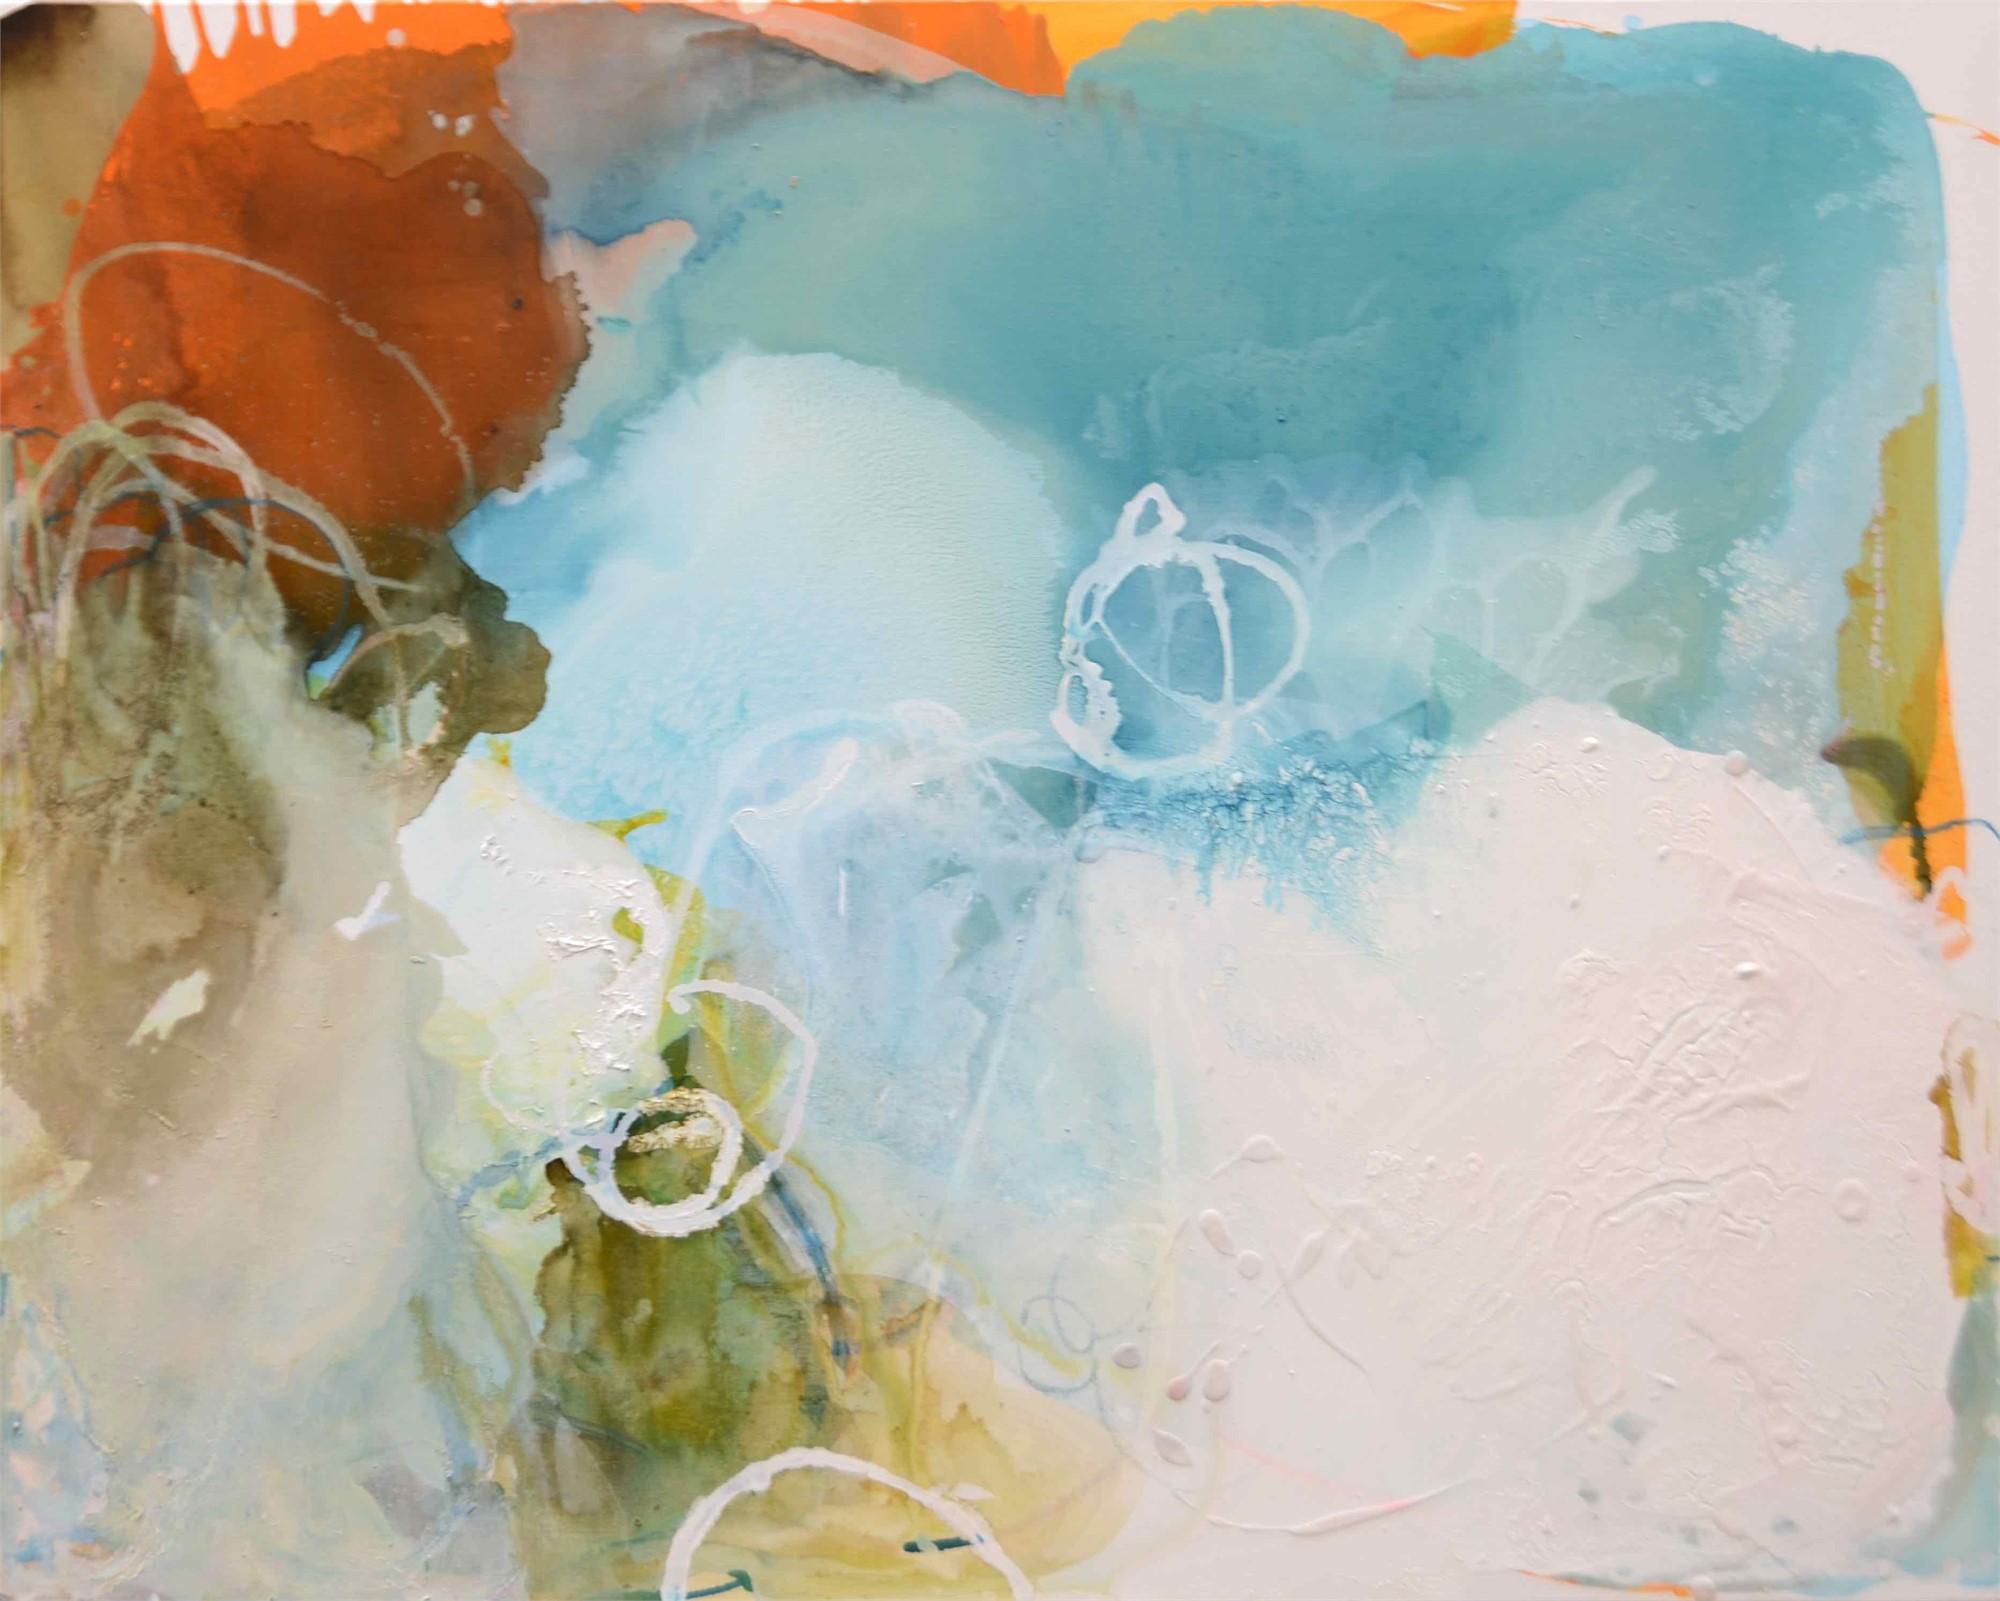 Ocean Gift 6 by Liz Barber